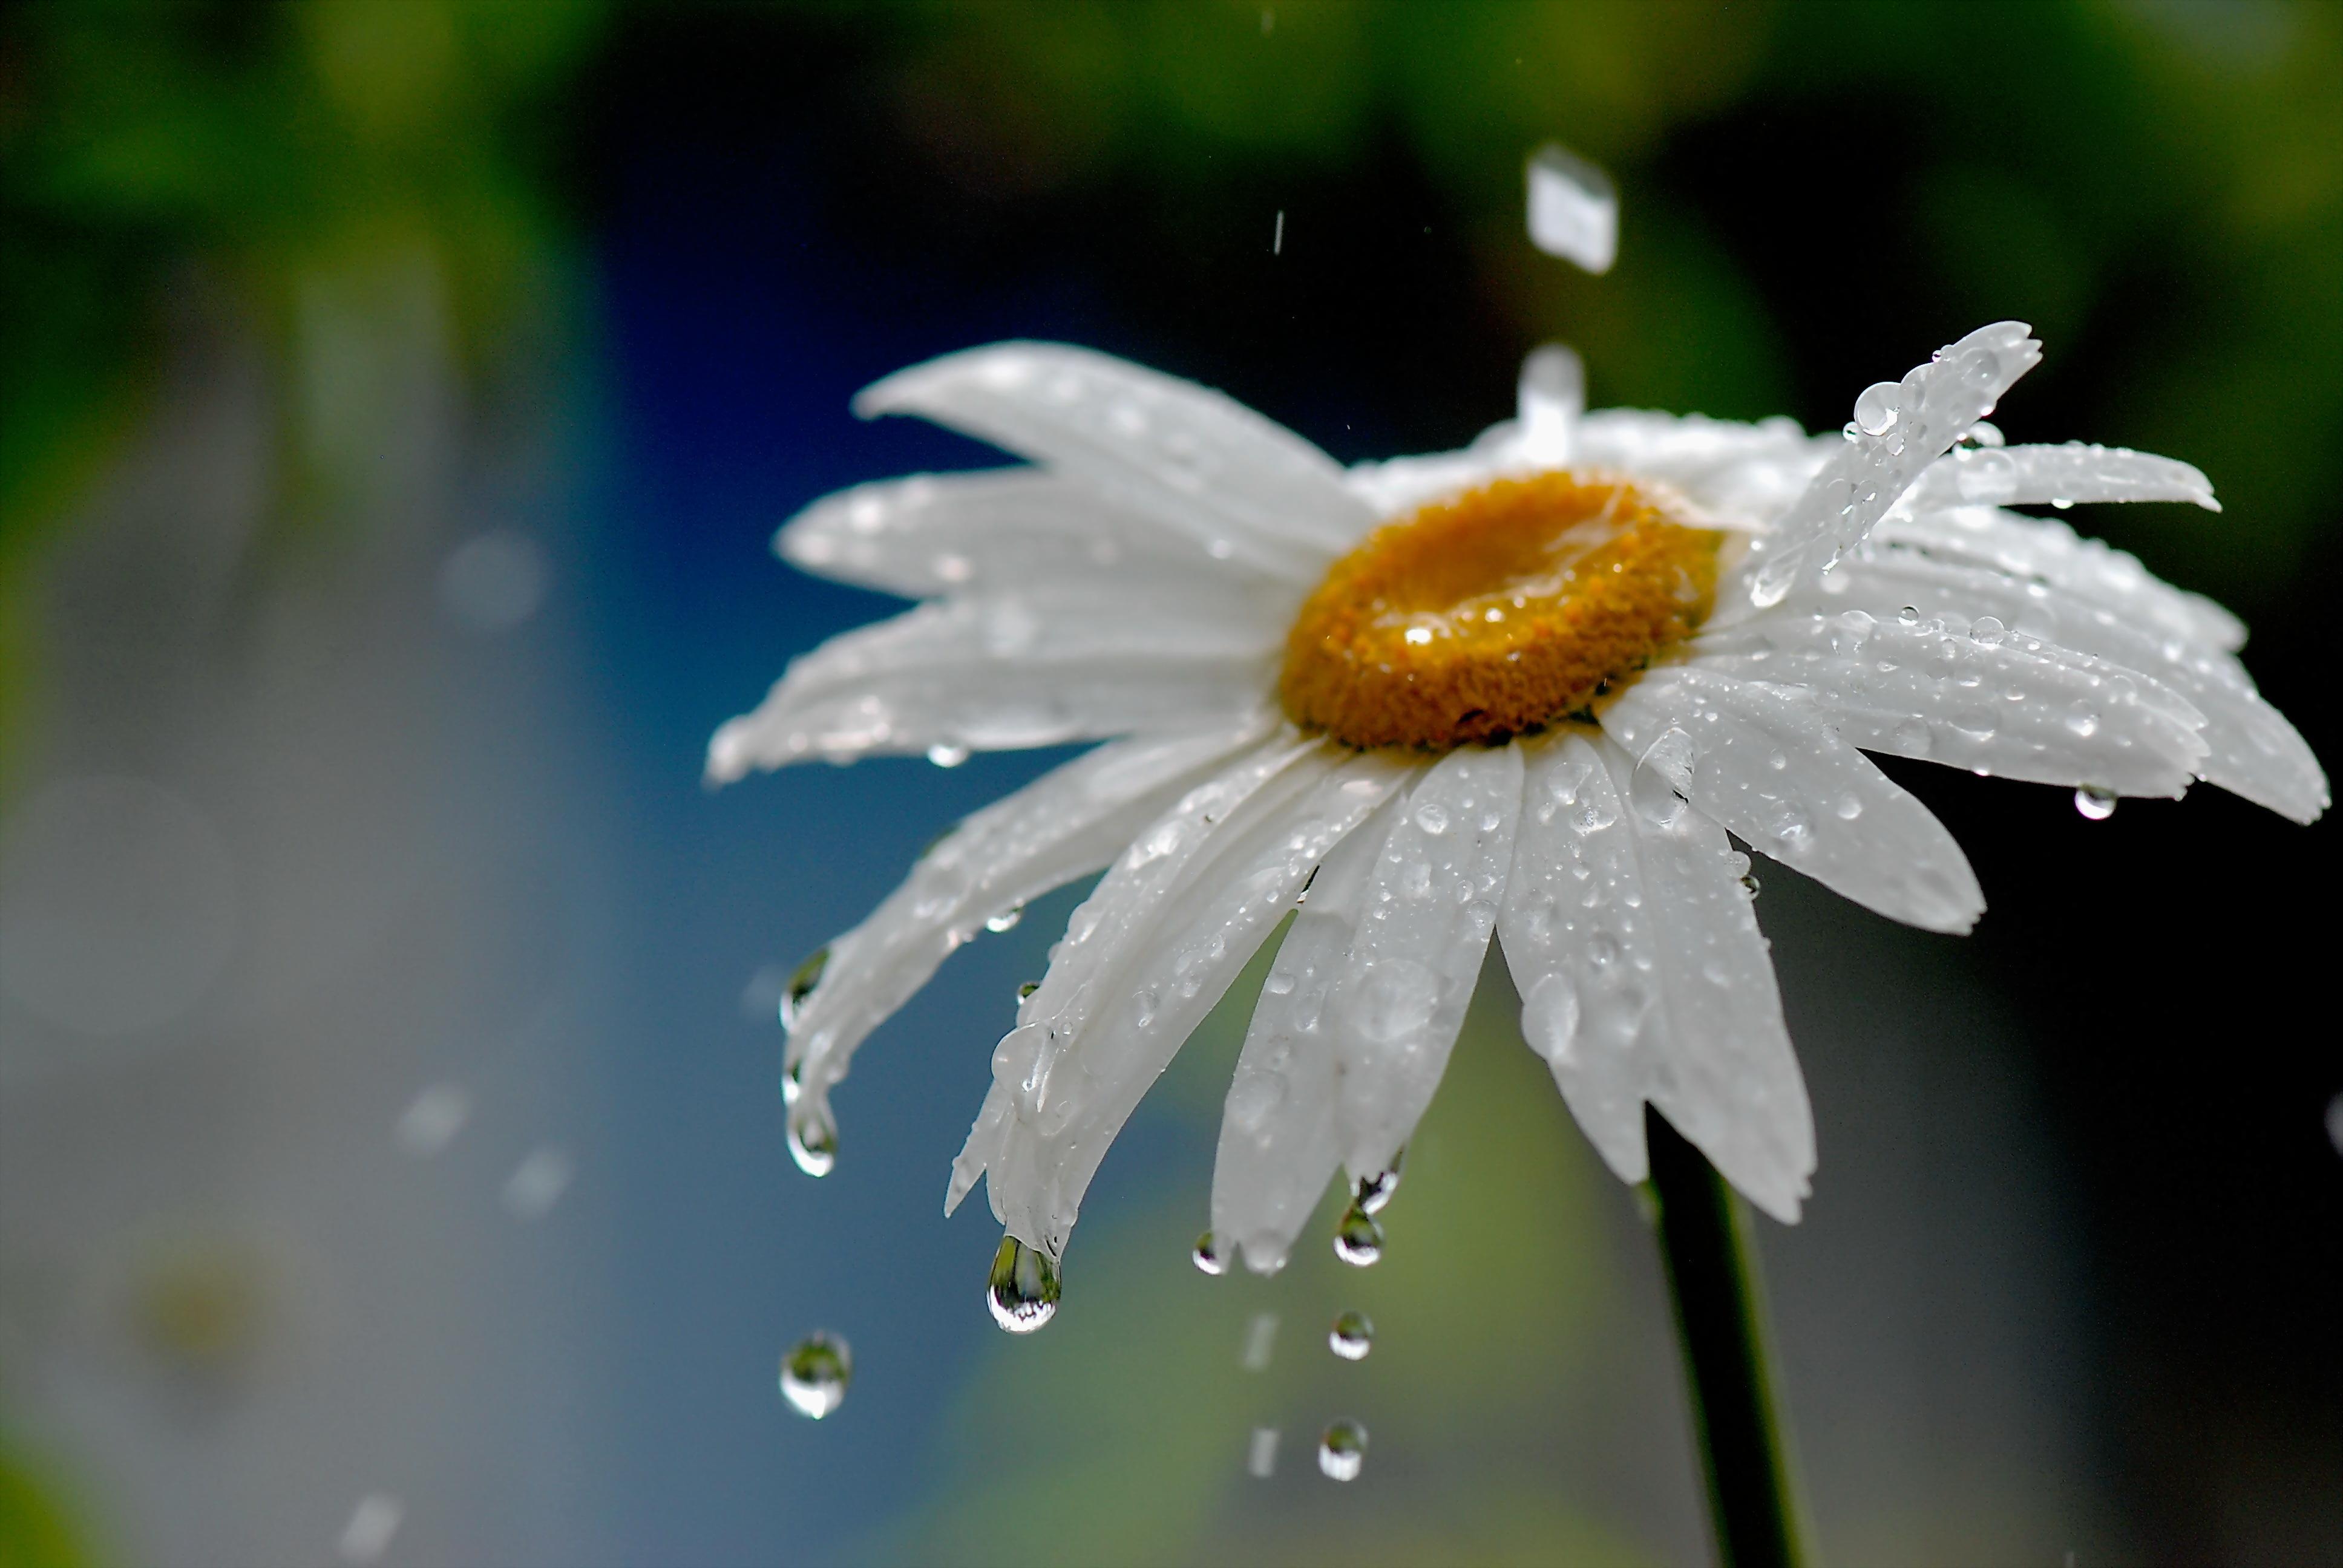 Image: Camomile, drop, petals, rain, water, flower